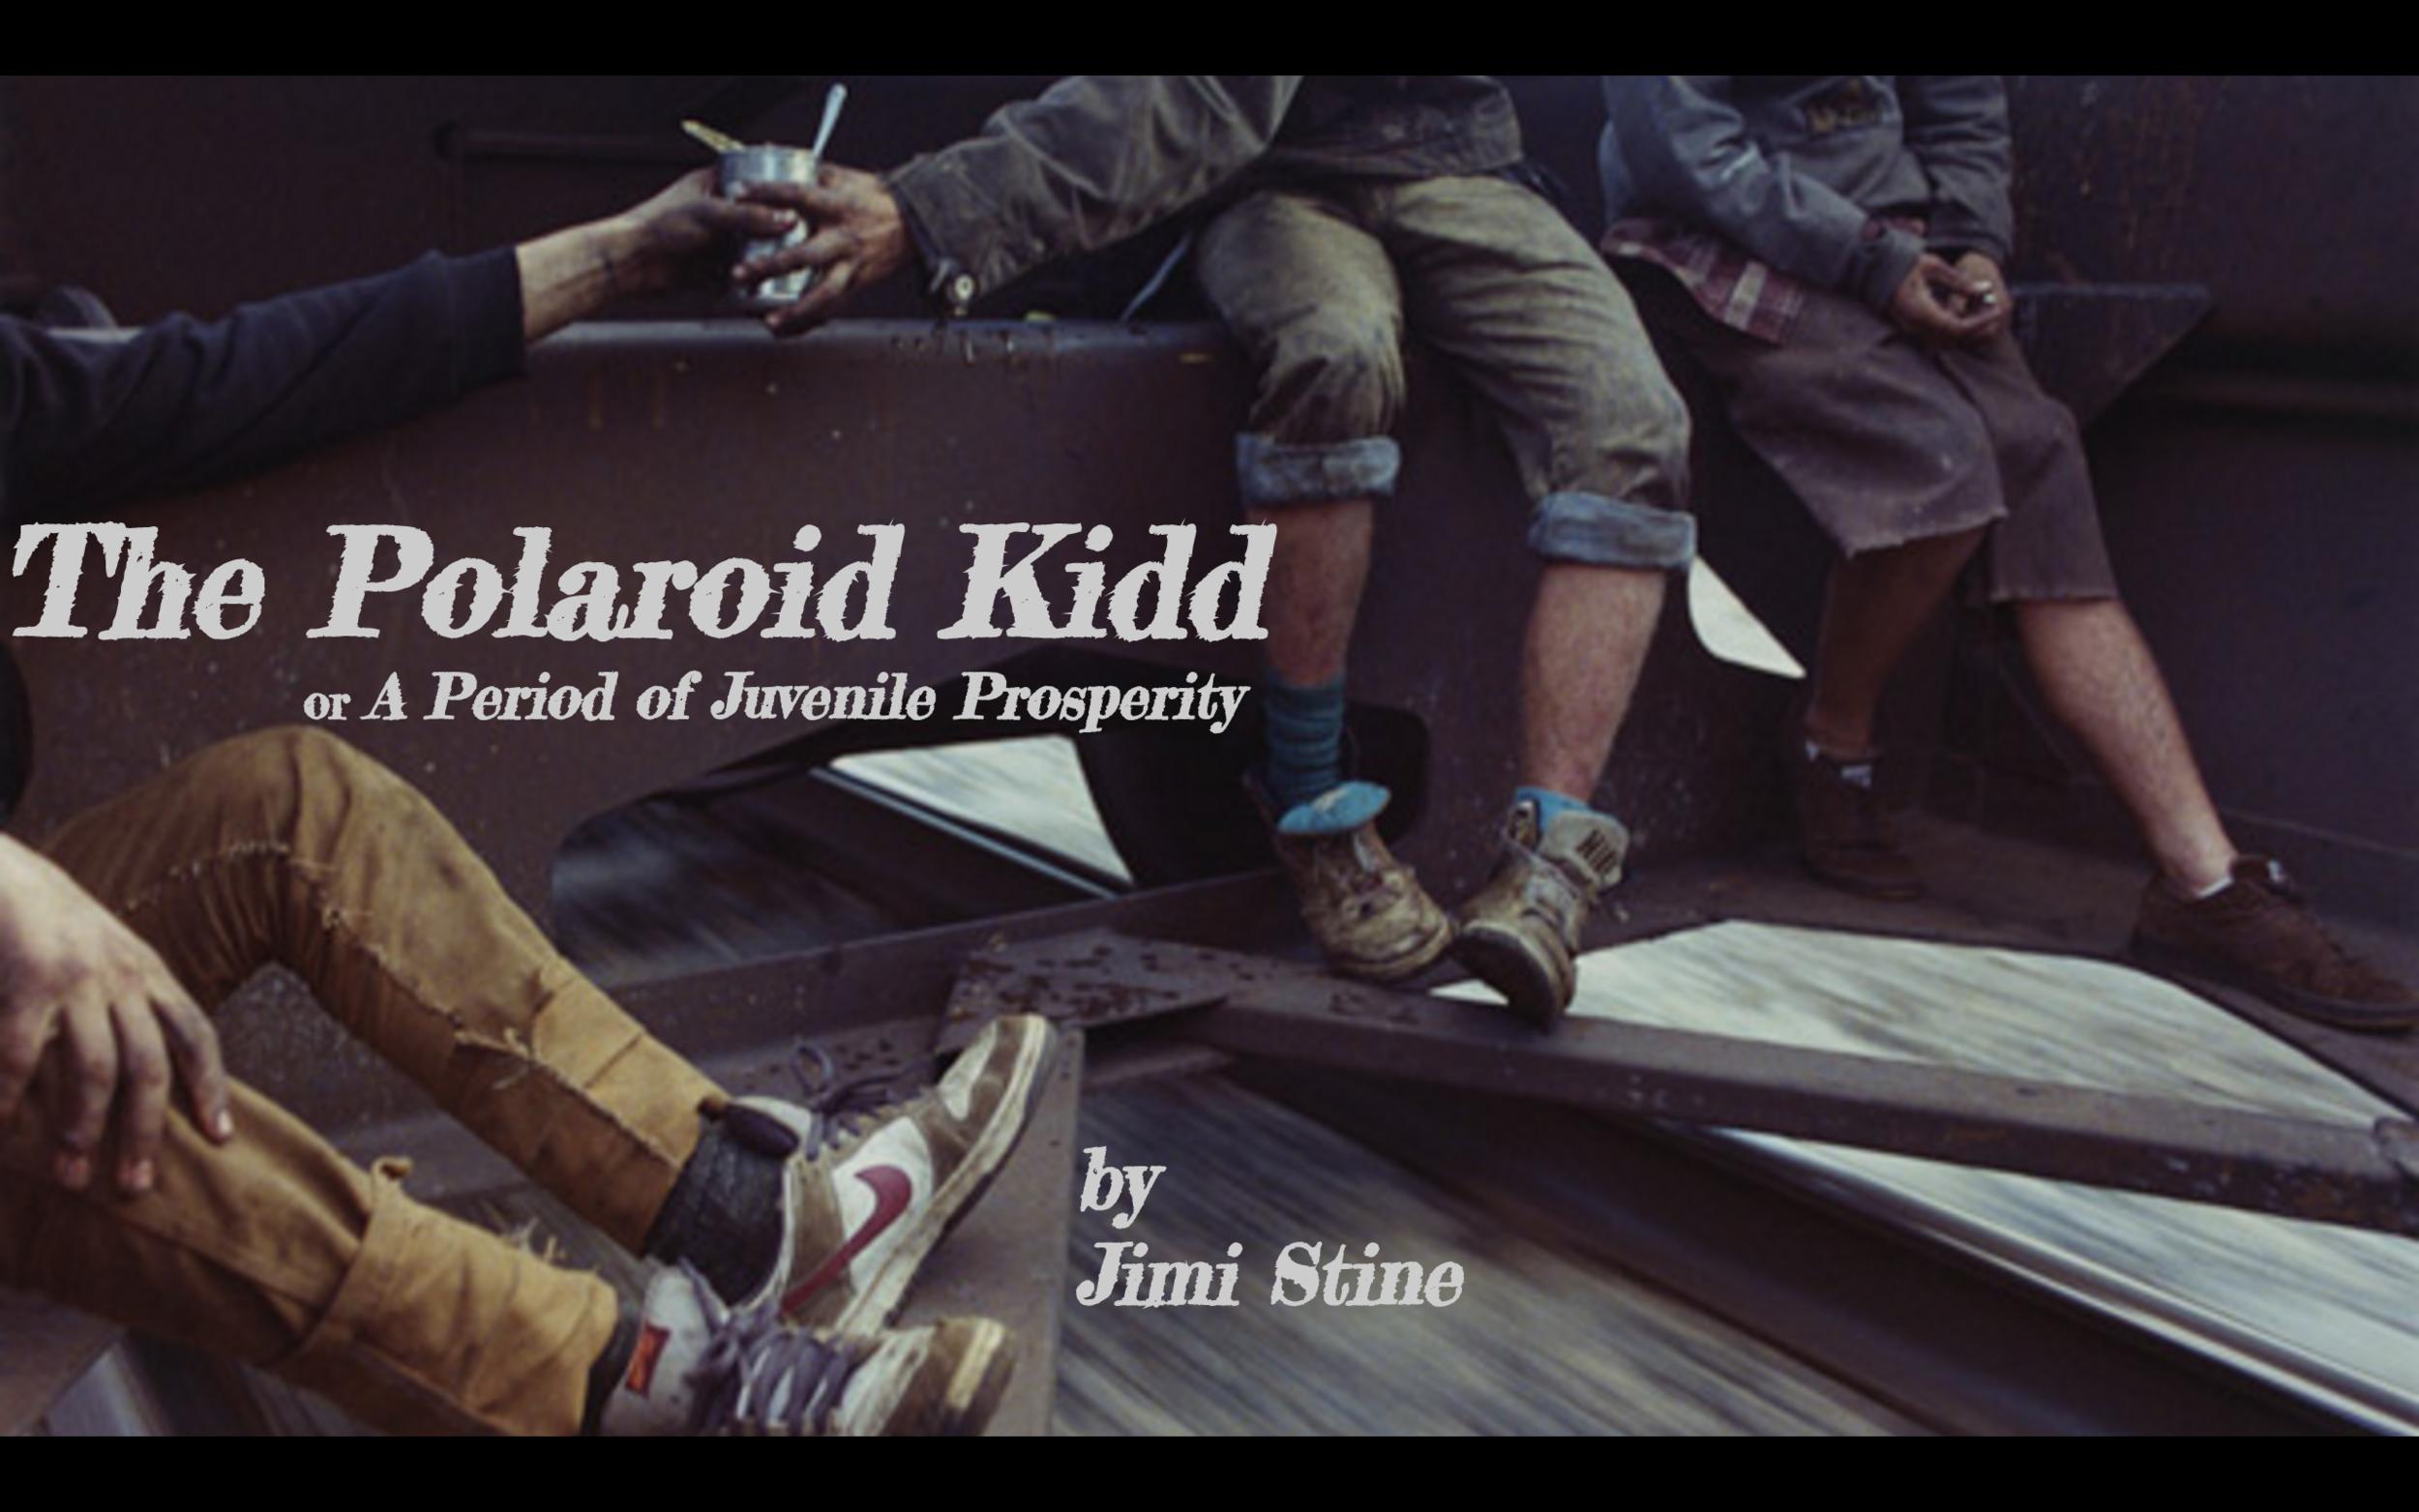 The Polaroid Kidd or A Period of Juvenile Prosperity